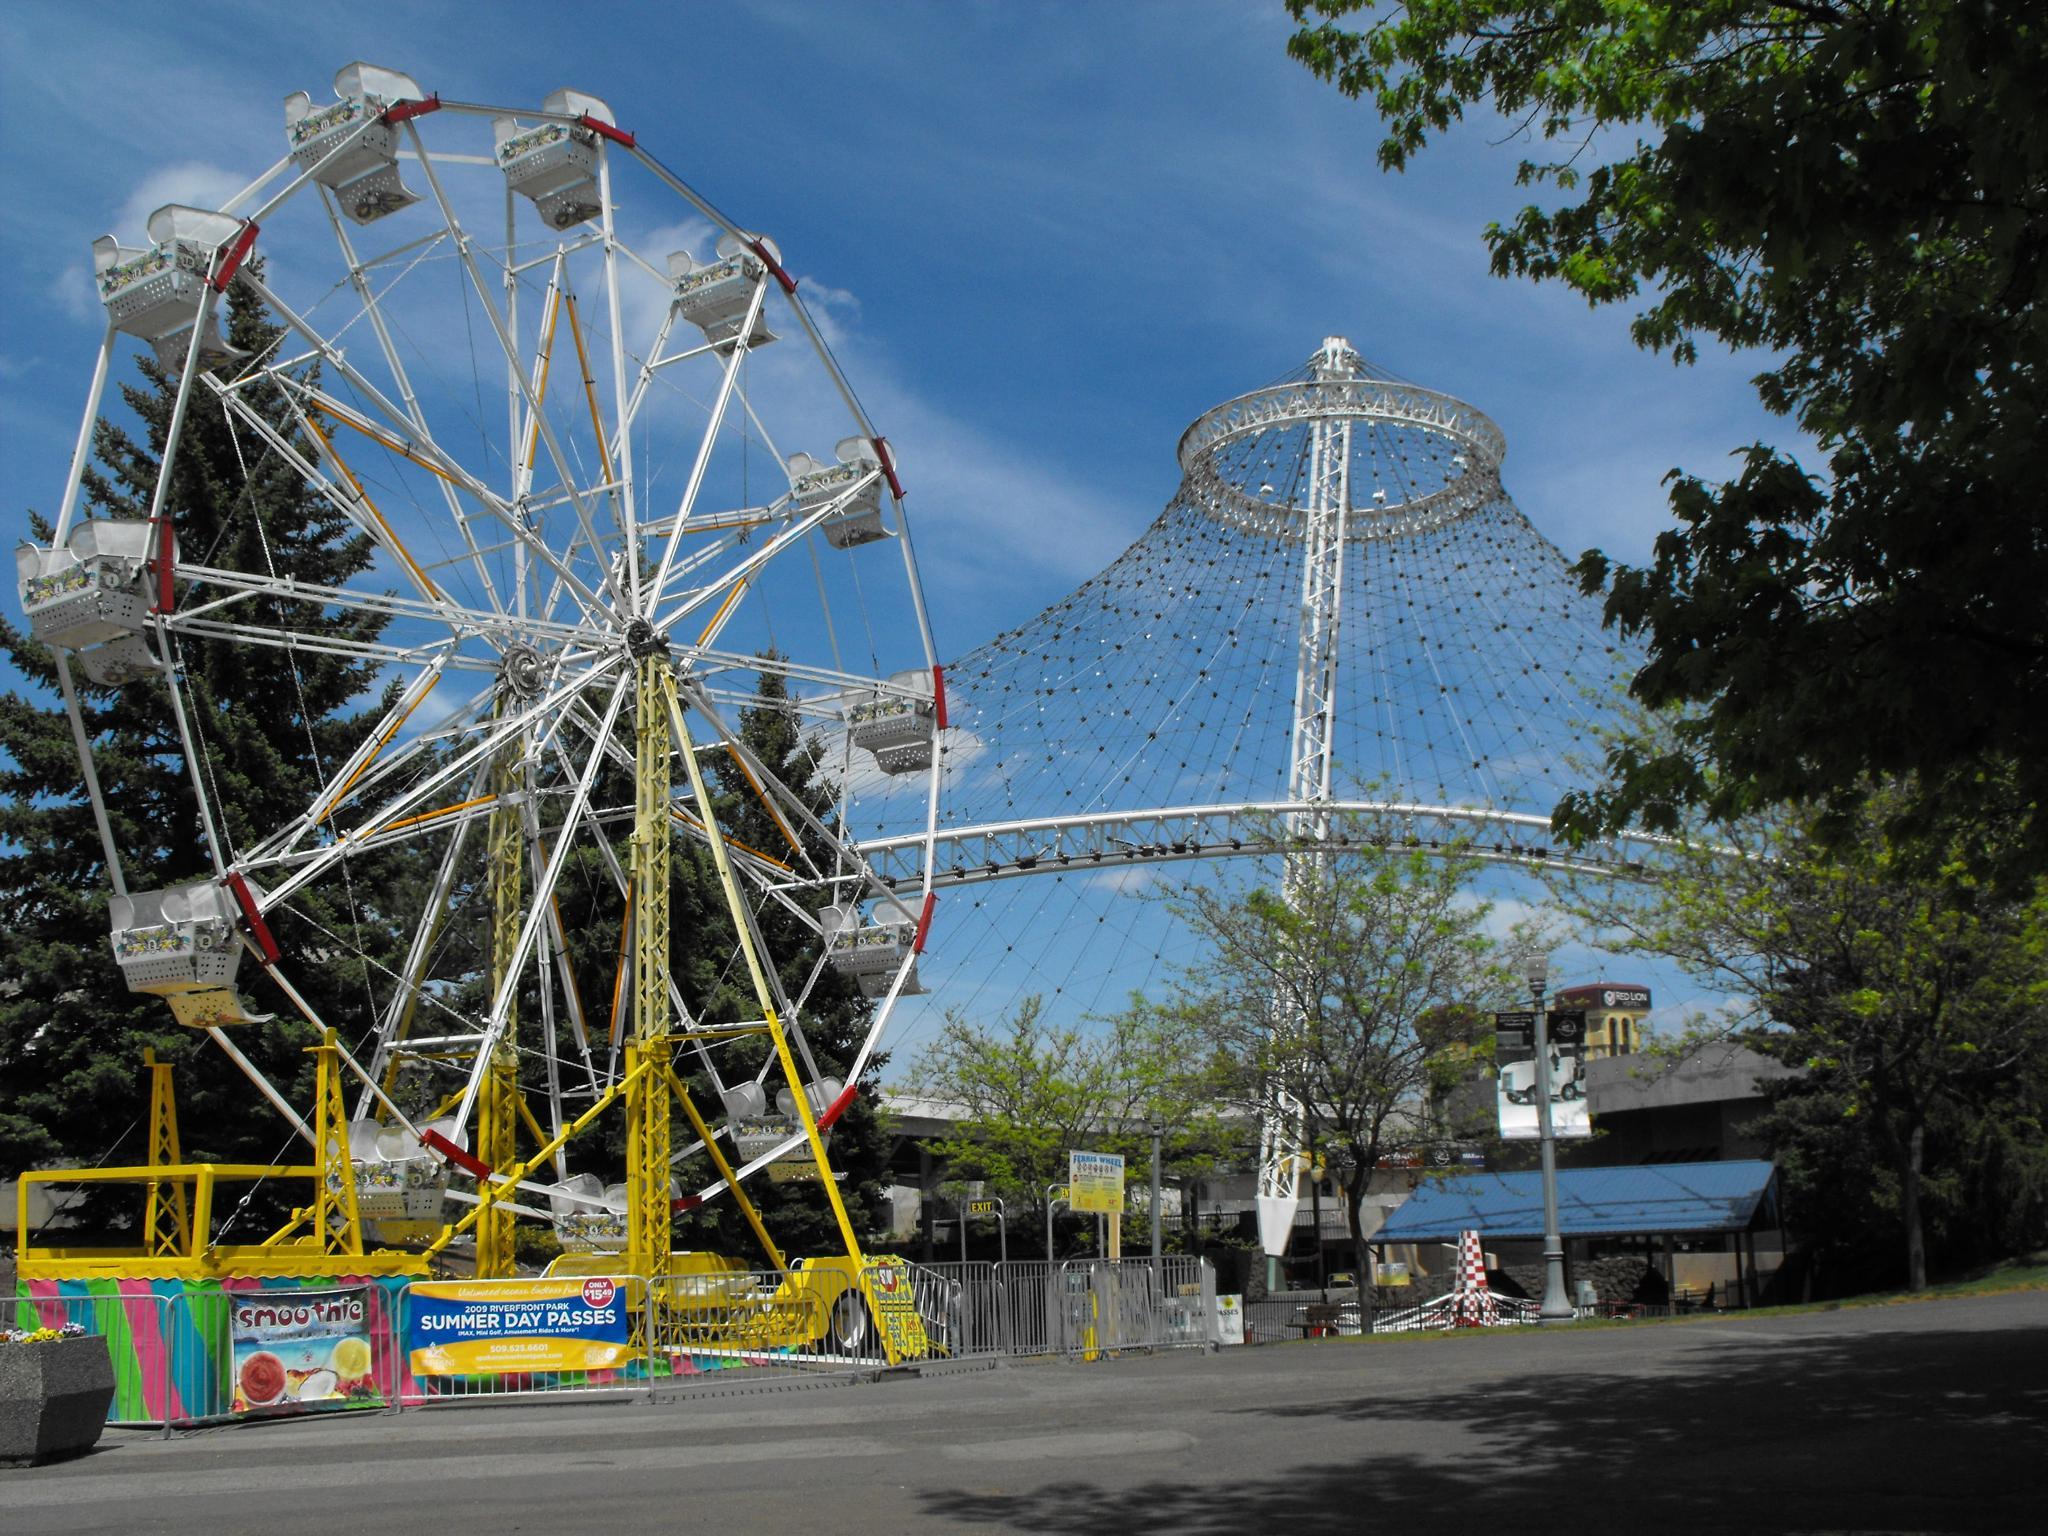 """Ferris Wheel & Pavilion"" by Ron Berkley"